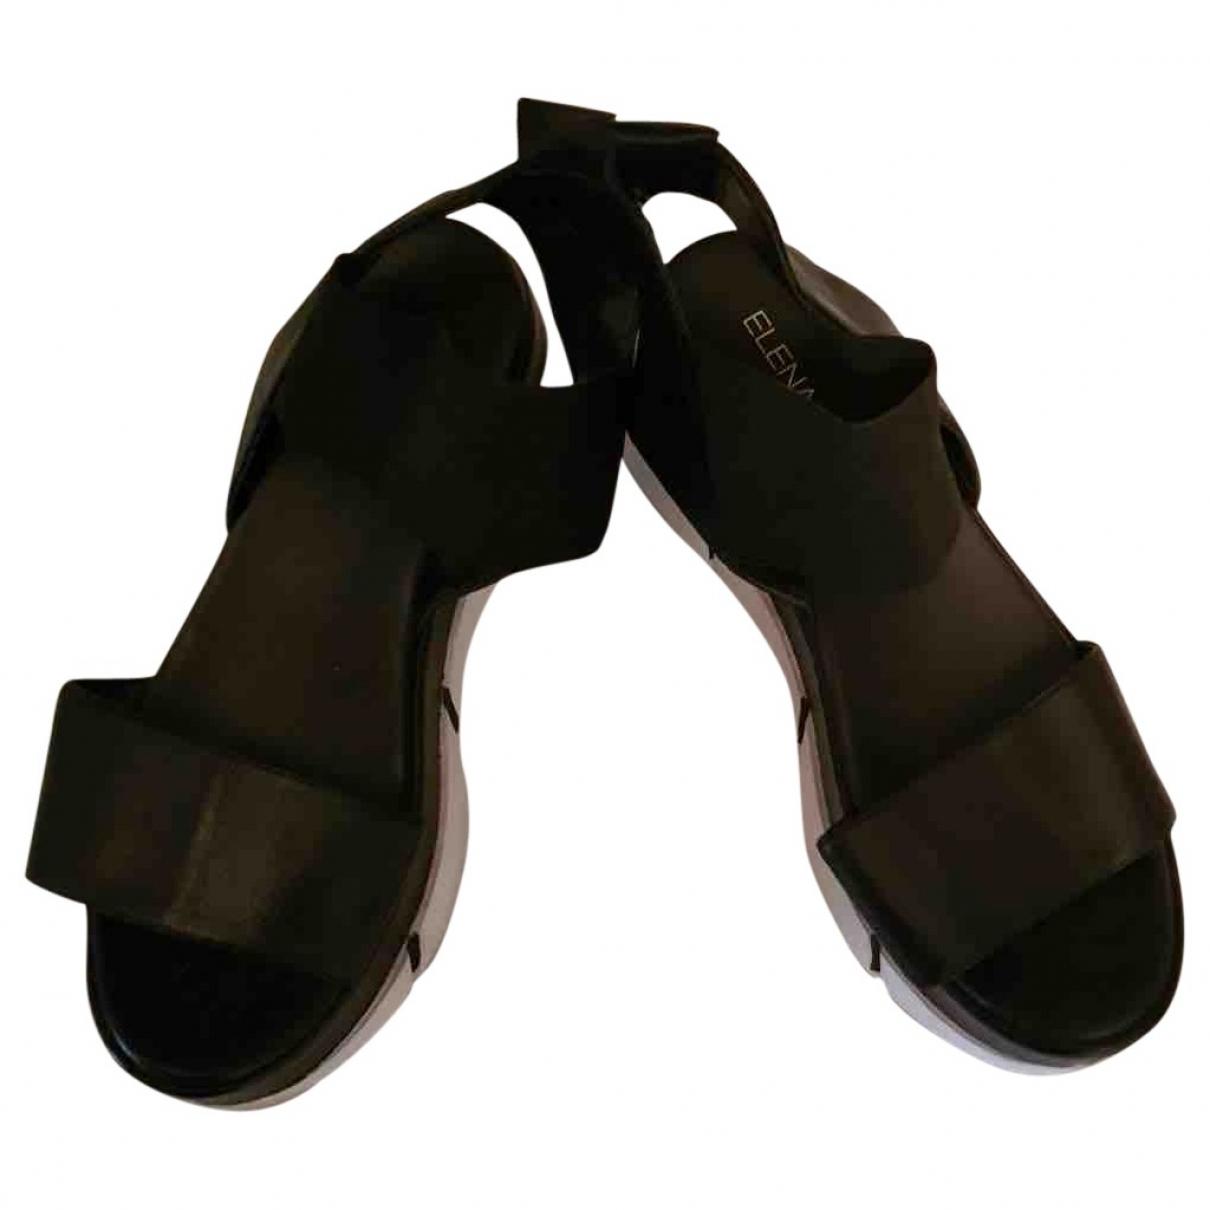 Elena Iachi \N Black Leather Sandals for Women 37 EU